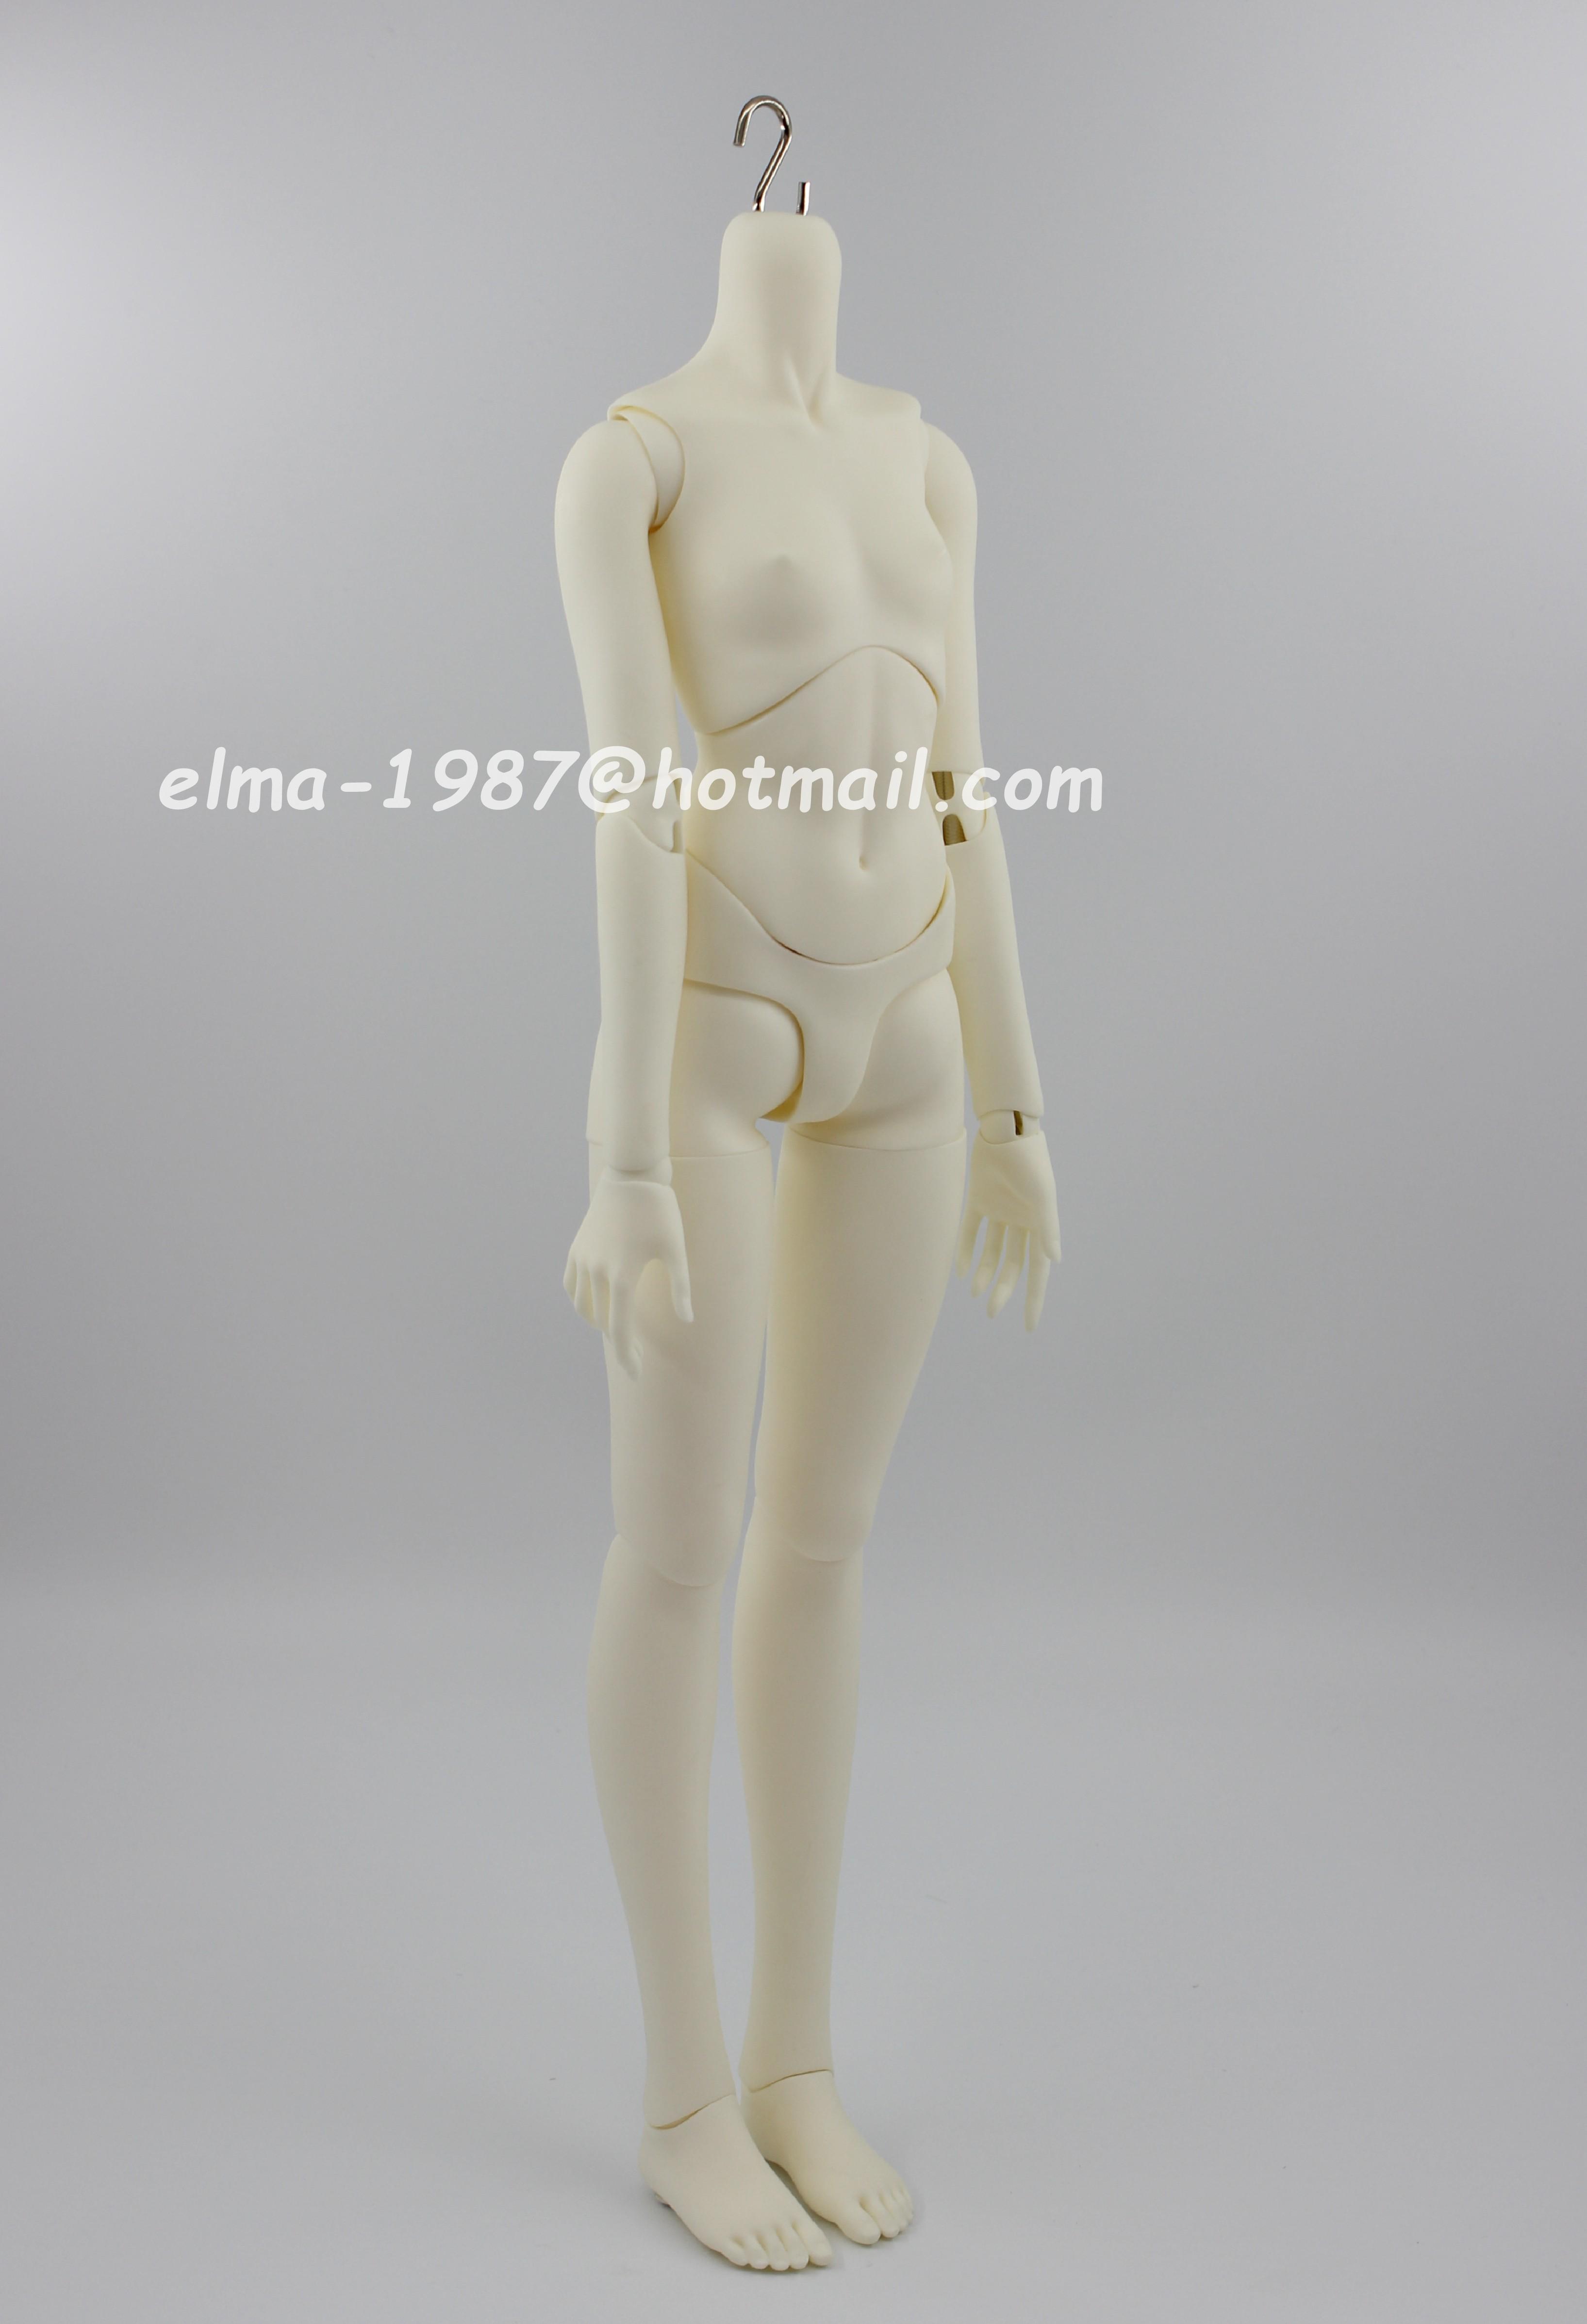 sdgr-flat-feet-small-breasts-body-1.jpg